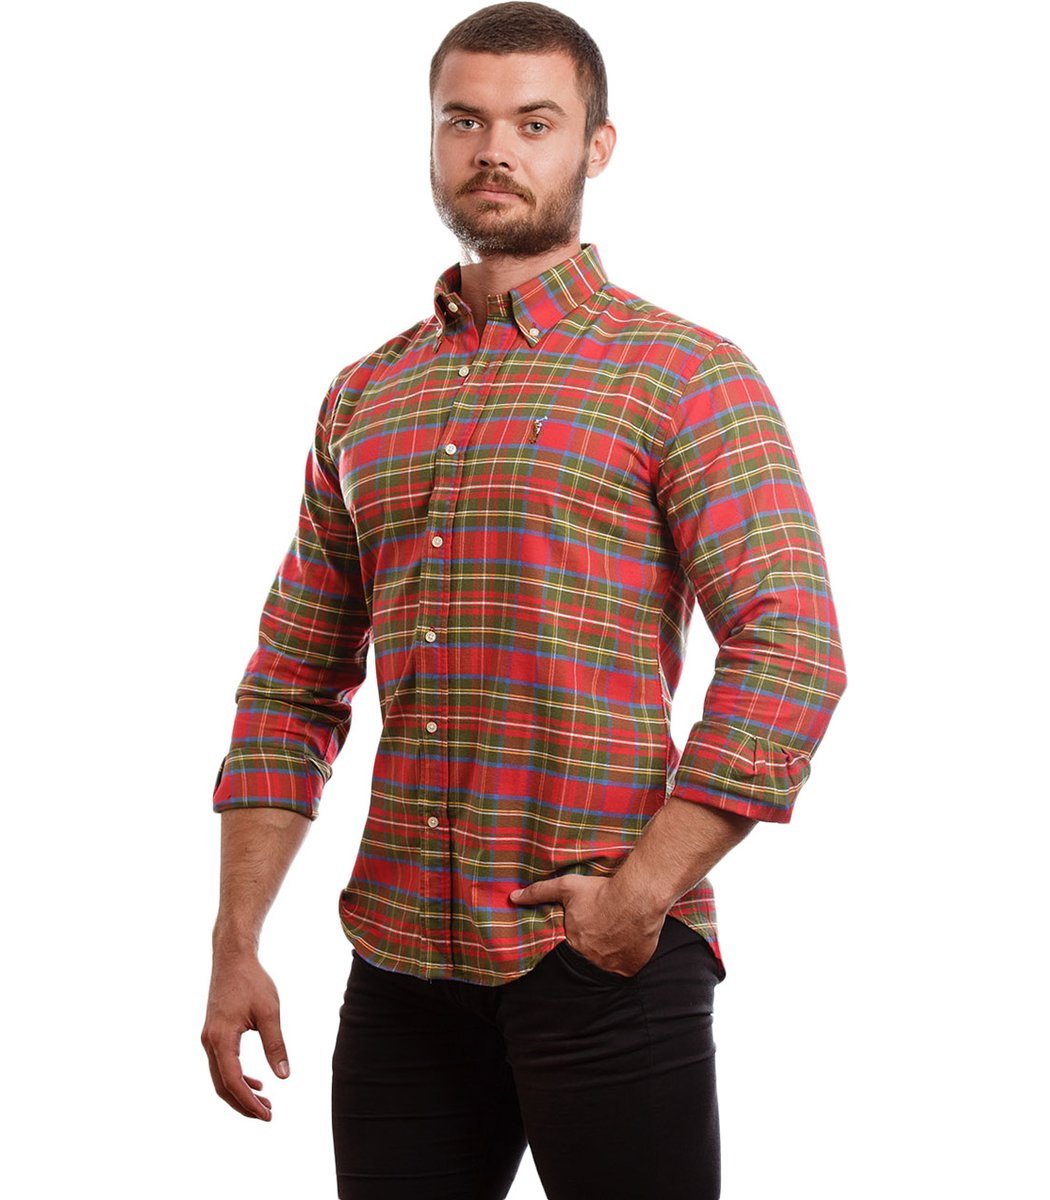 Рубашка POLO Ralph Lauren CELL BBB (Красный/Зеленый/Голубой)